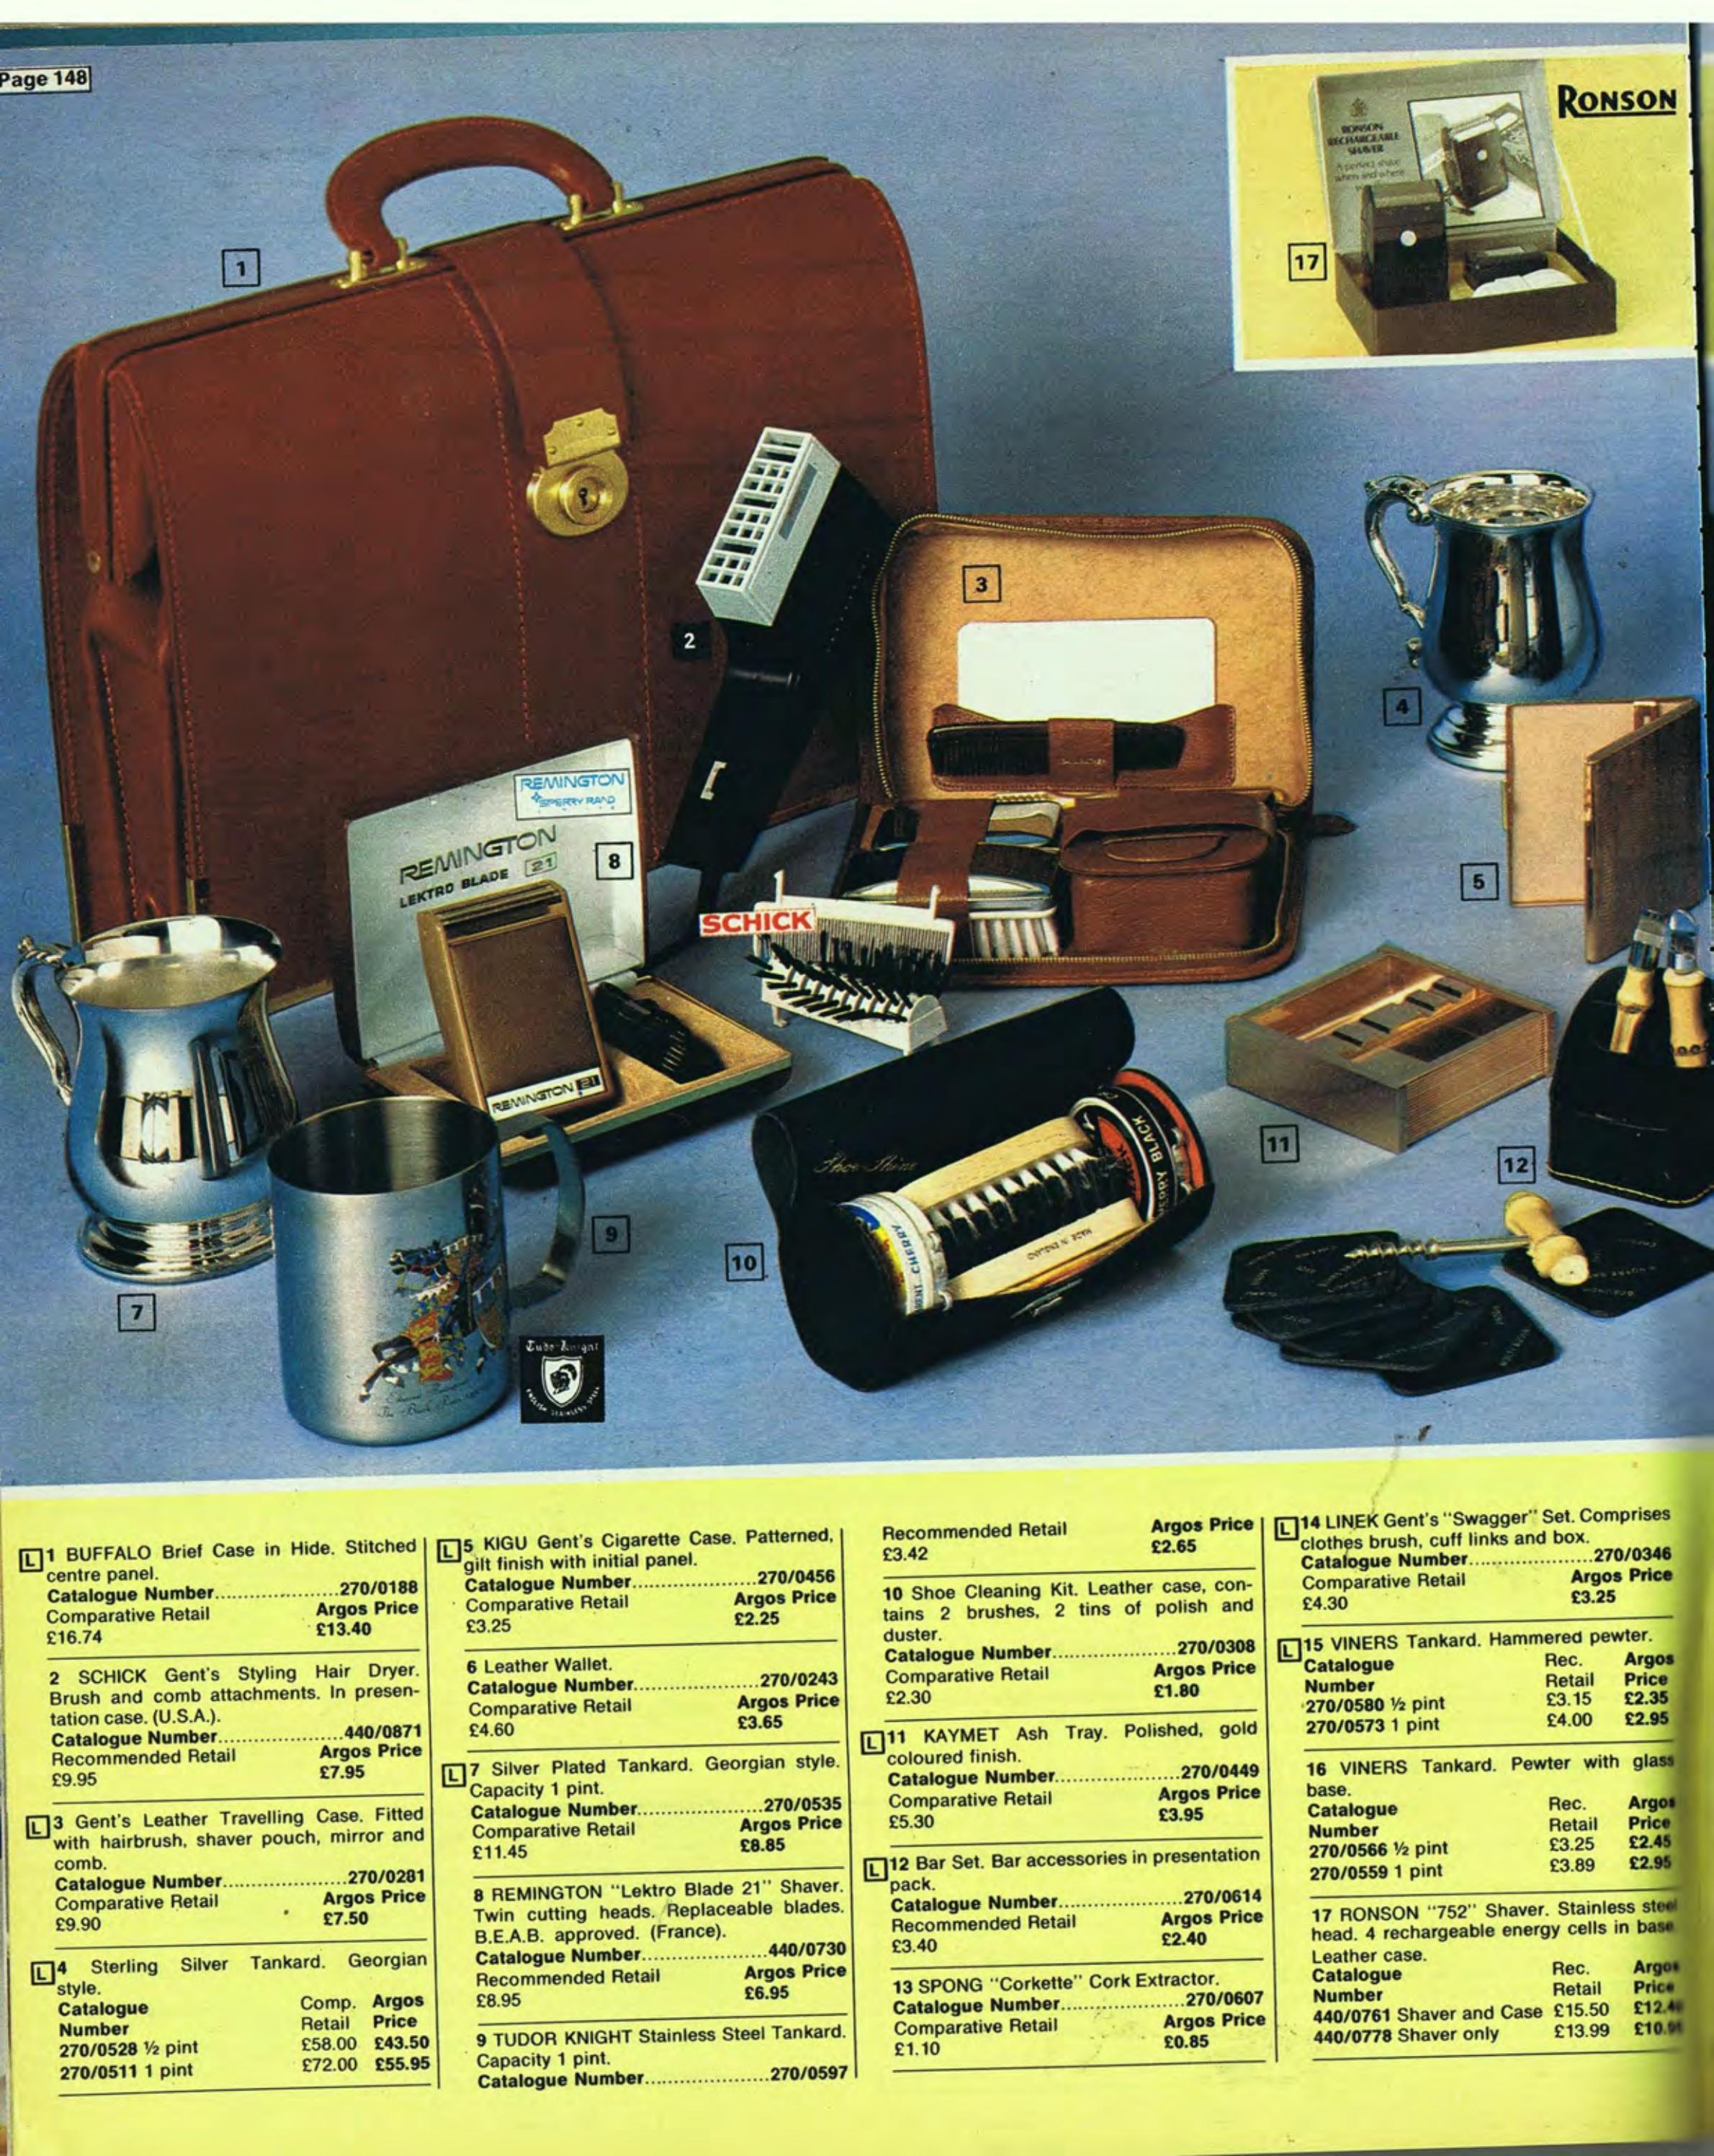 speical offer wholesale price get online Argos No.02 1974 by Retromash - issuu